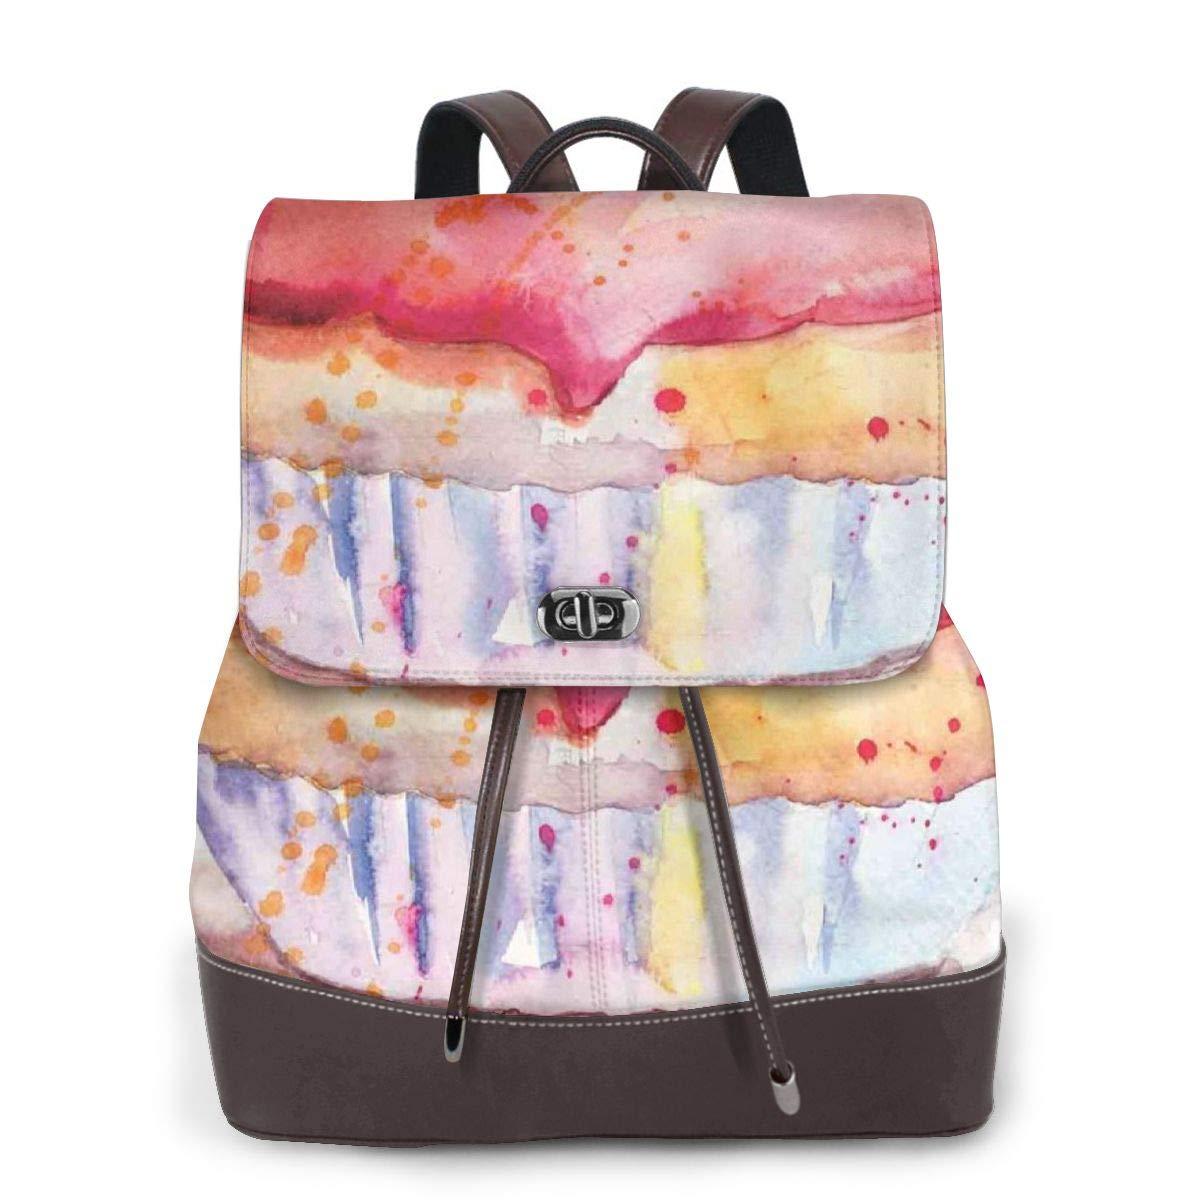 Women's leather backpack,Ink Splatter Watercolor Illustration Of Cherry Sweet Buttercream Frosting Cupcake,School Travel Girls Ladies Rucksack by GULTMEE